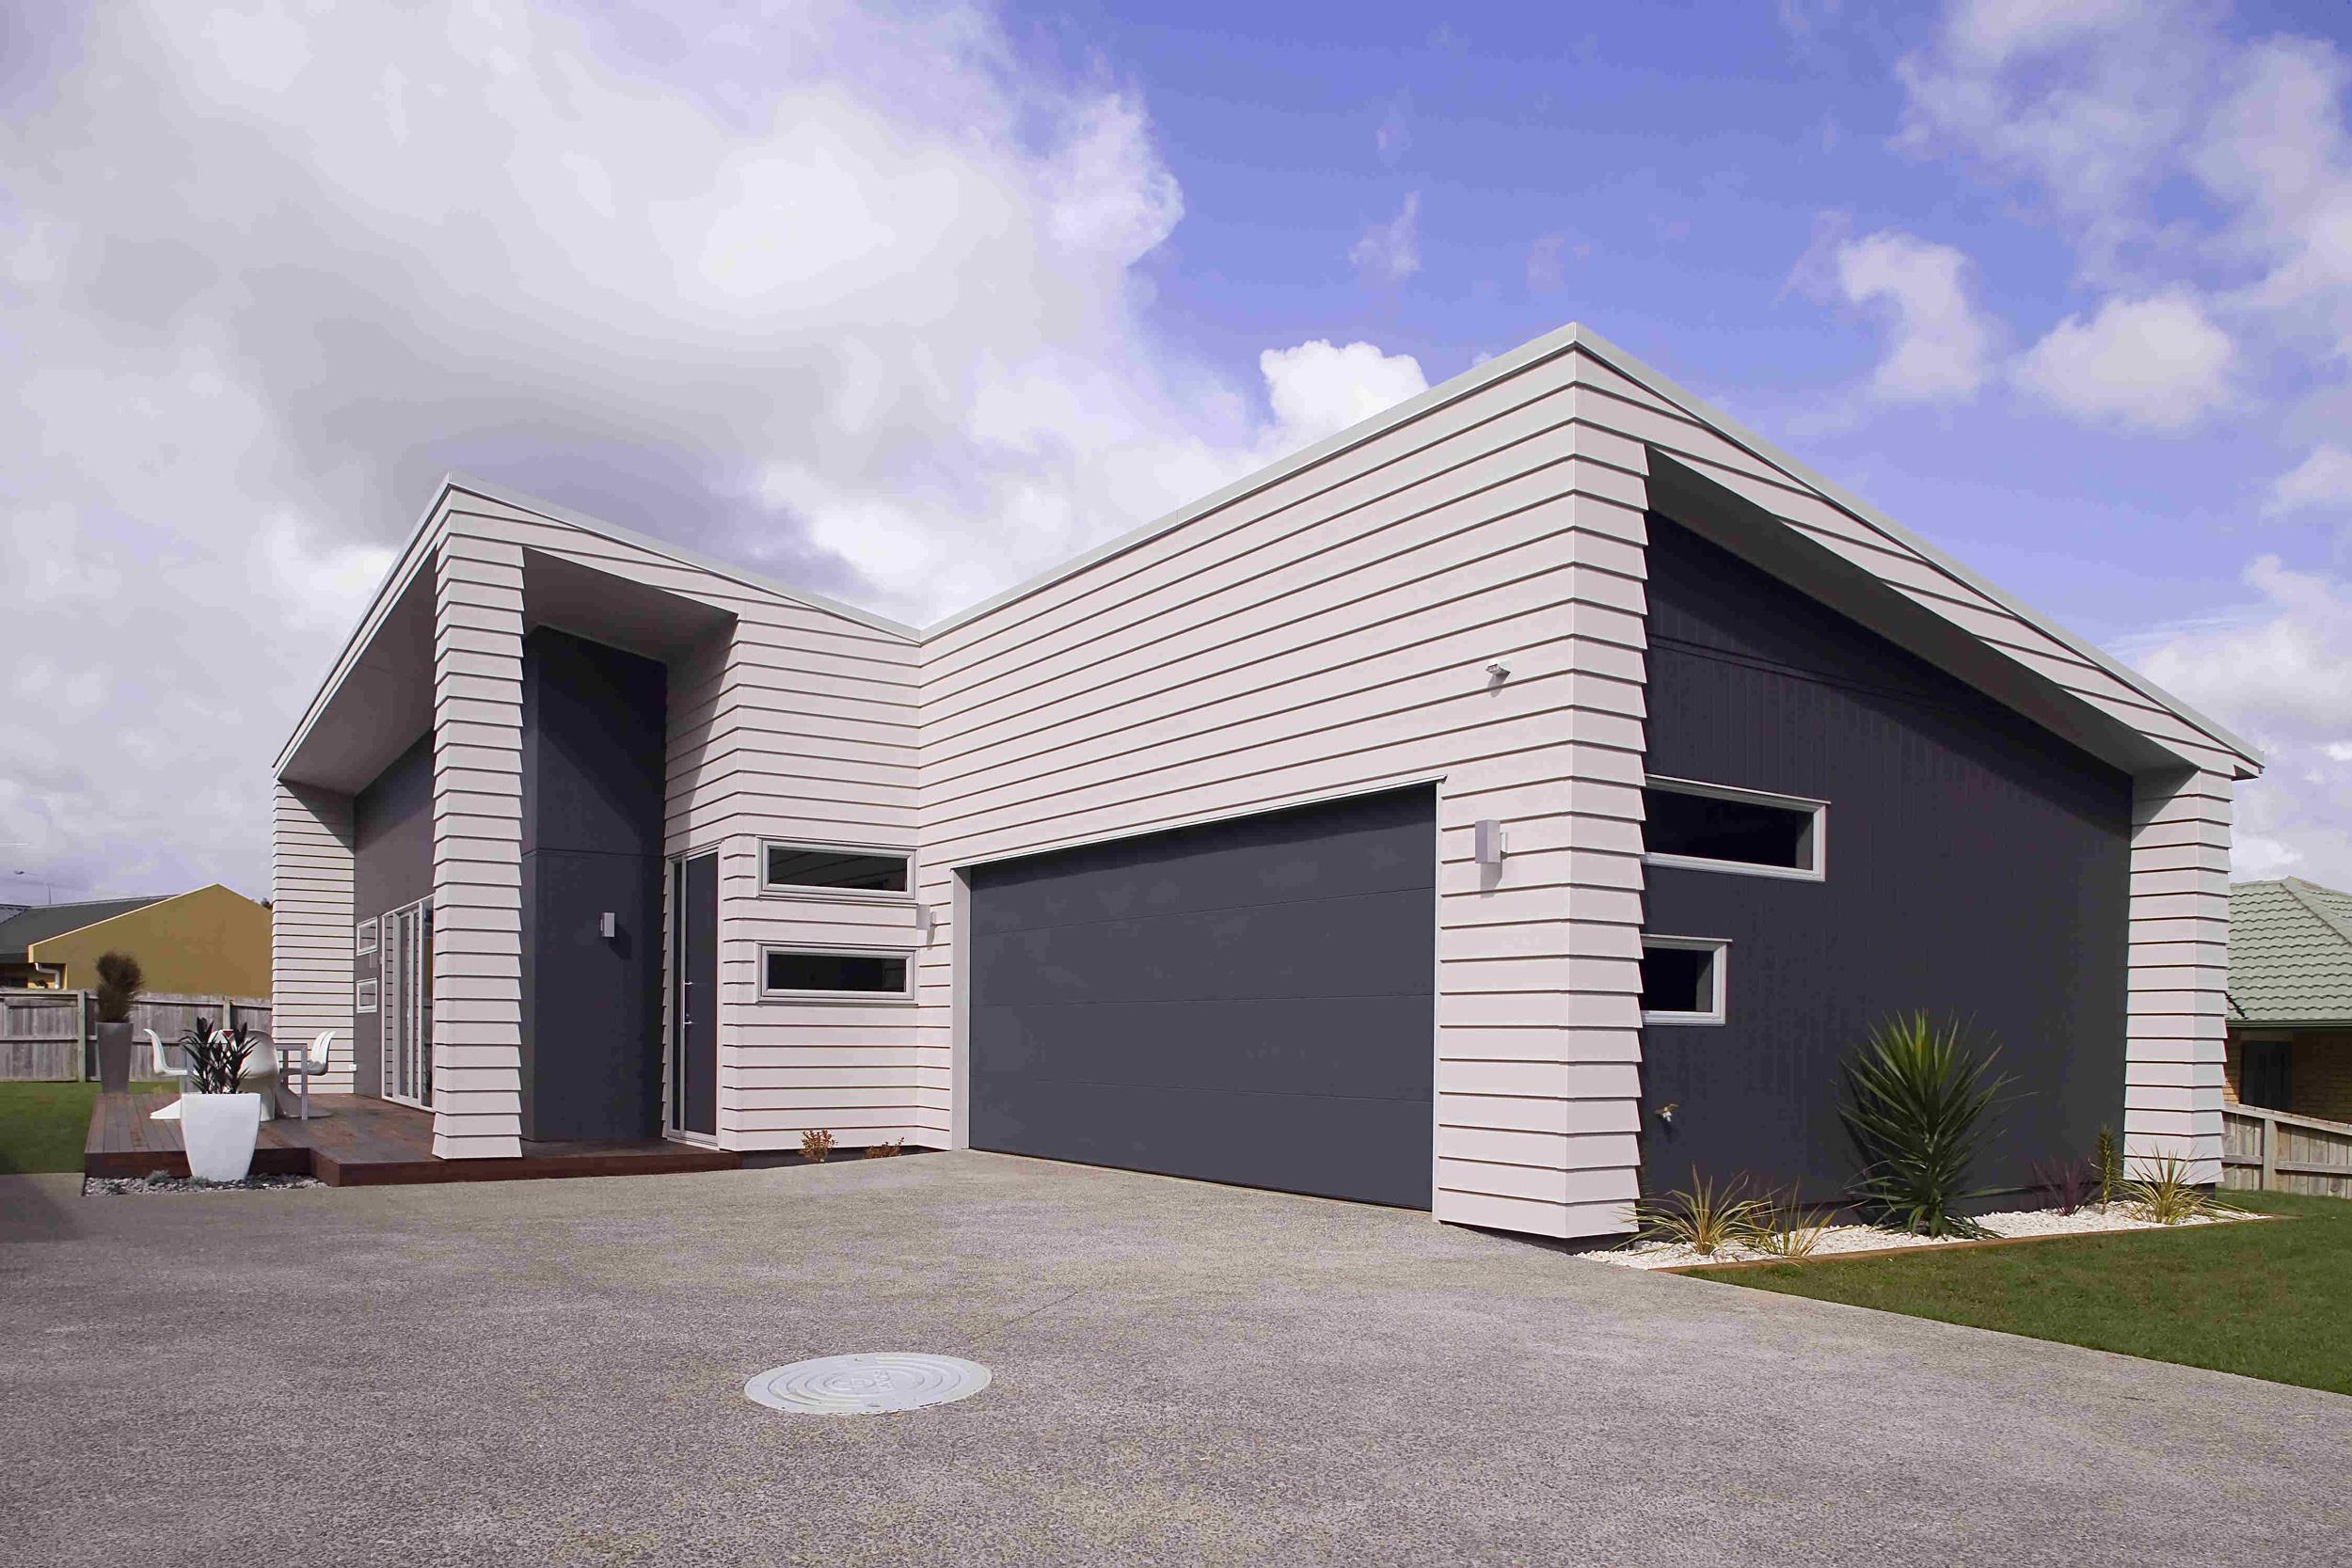 haven-builder-residential-les-fisher-11.jpg